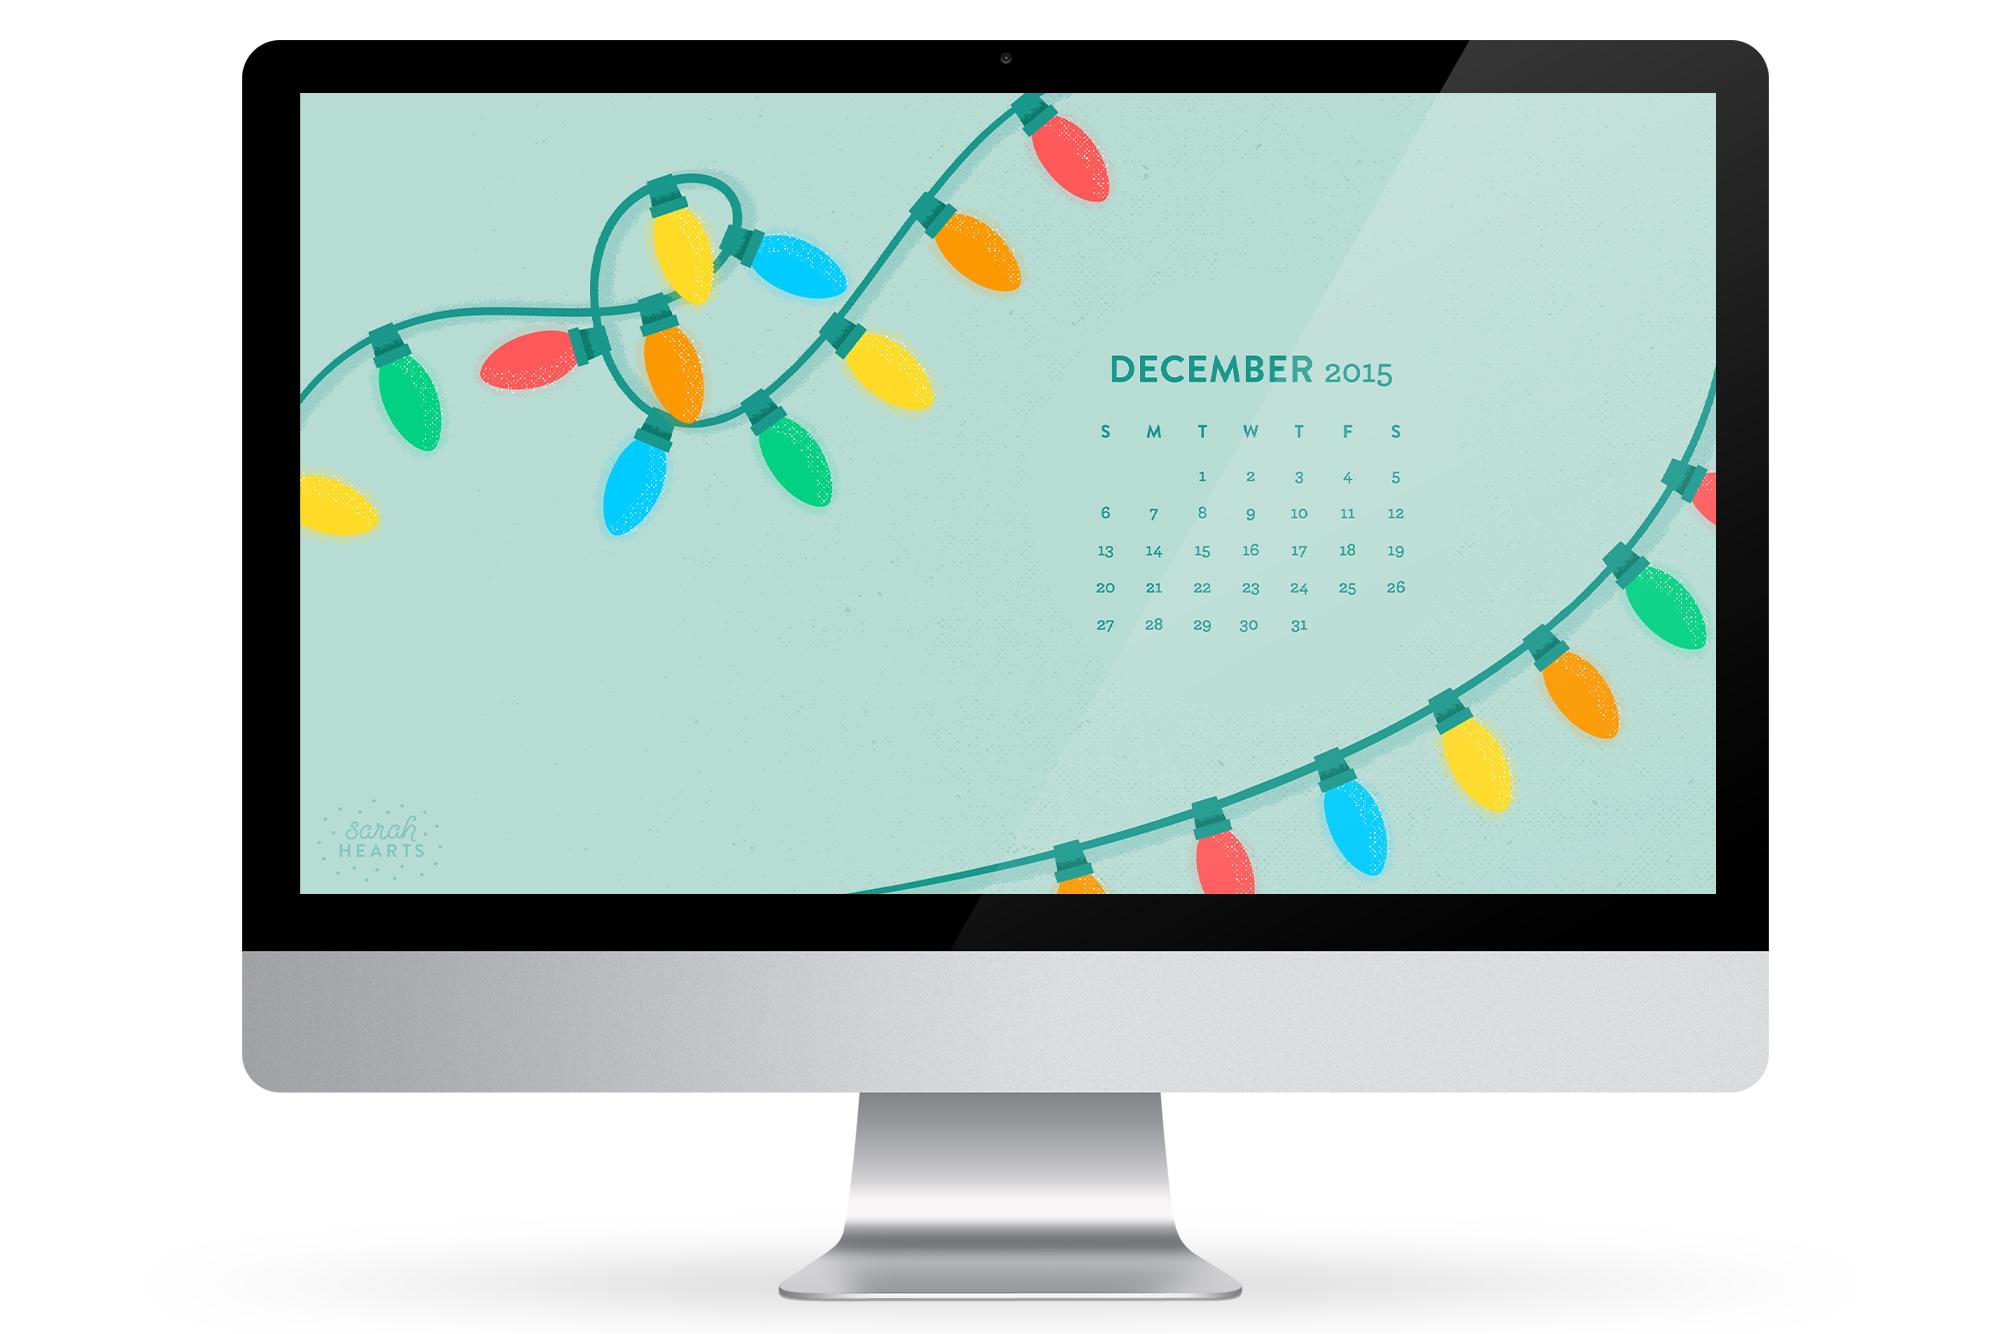 Tablet Calendar Wallpaper : December calendar wallpaper sarah hearts